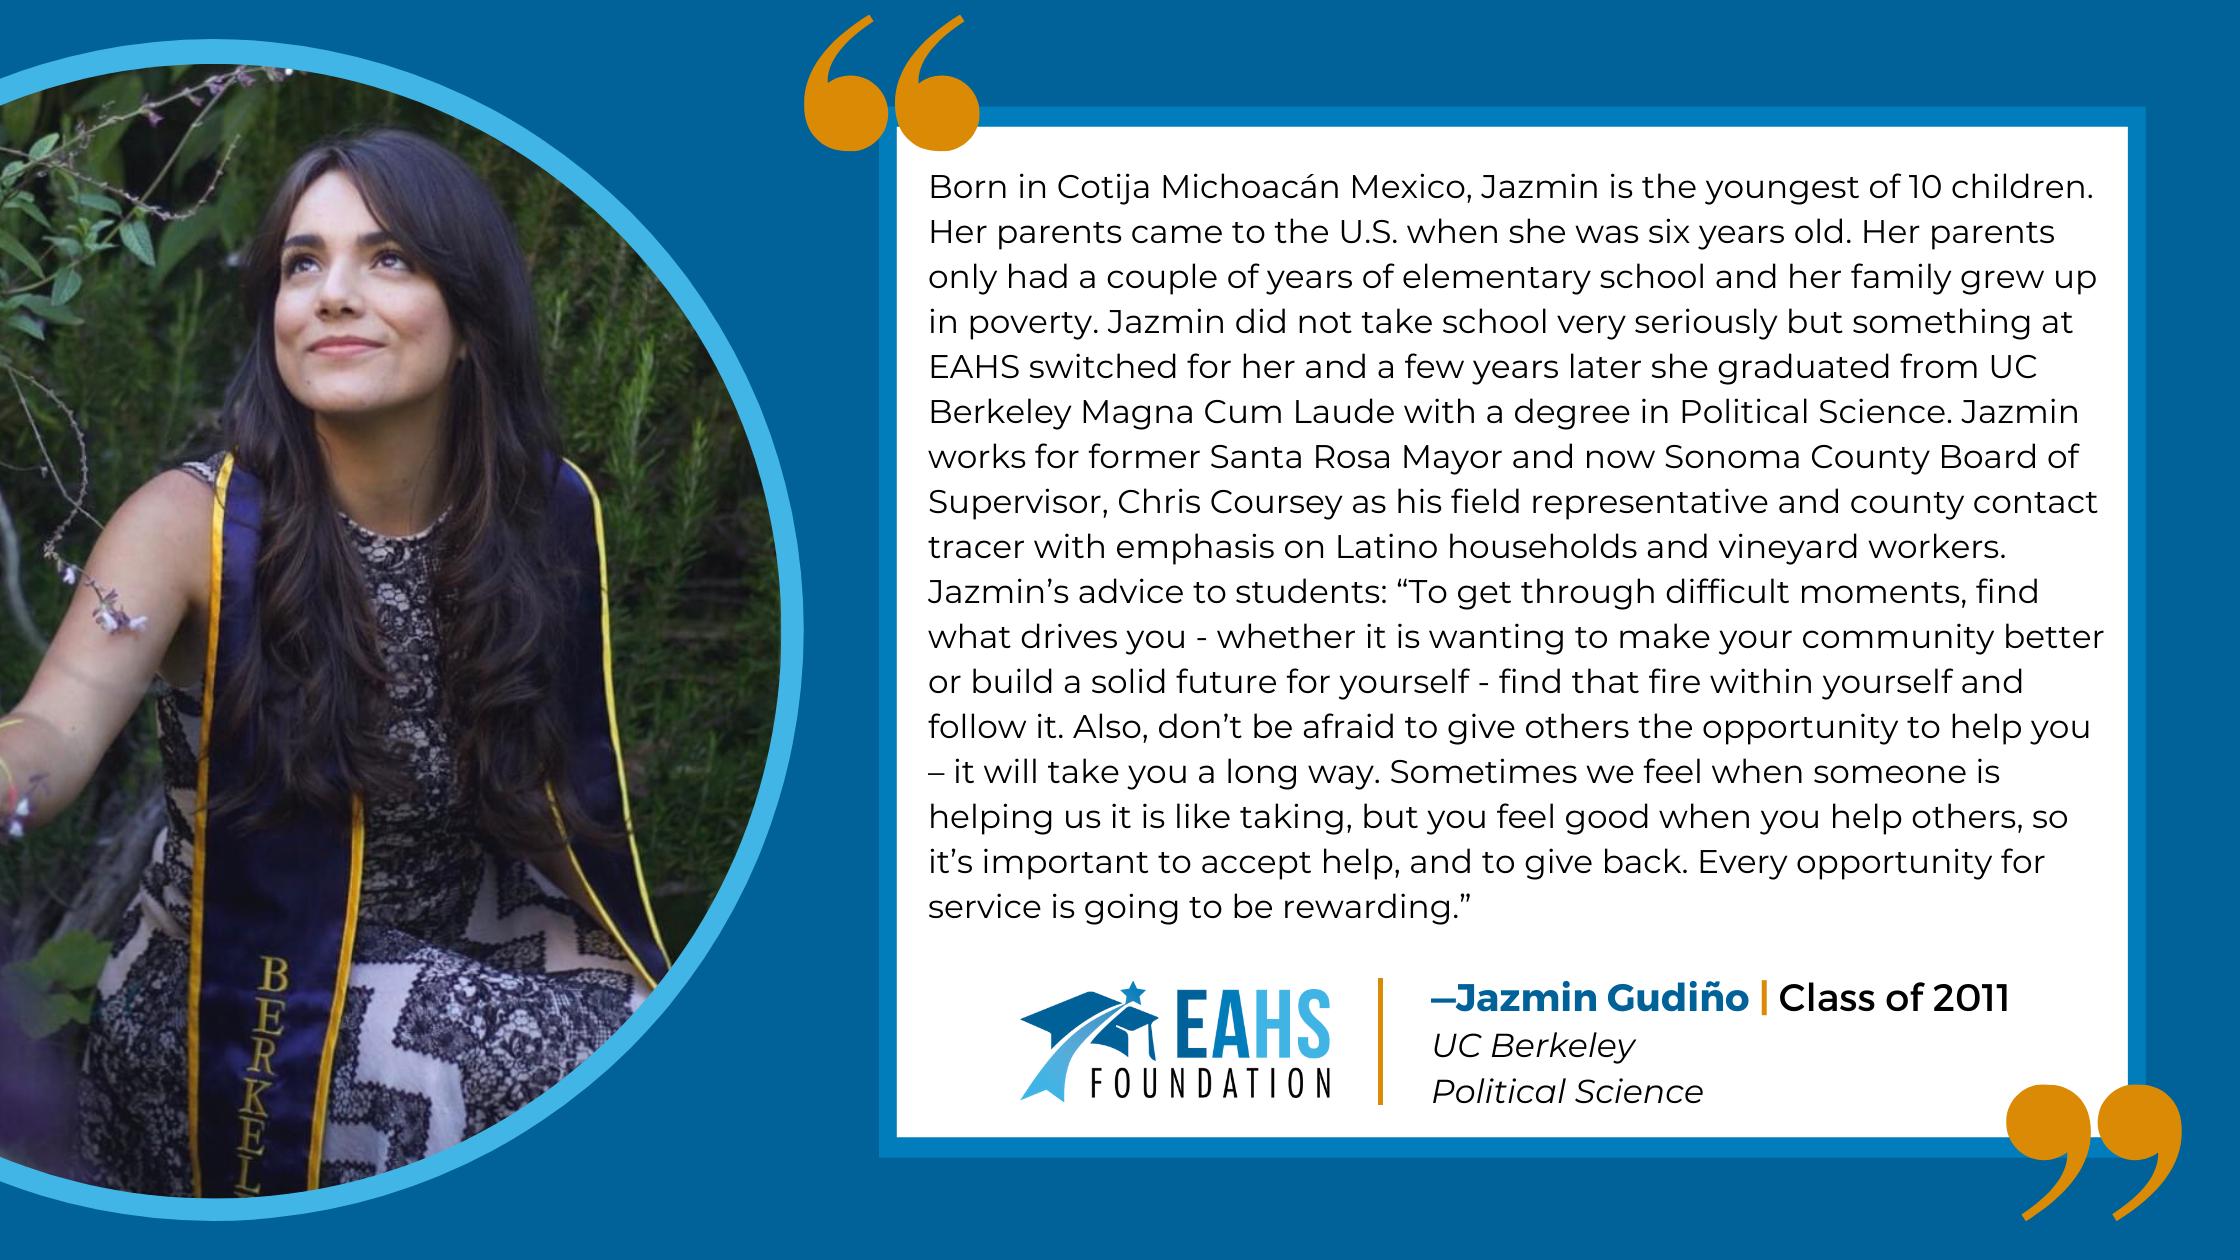 Alumni Spotlight - Jazmin Gudiño, EAHS Foundation